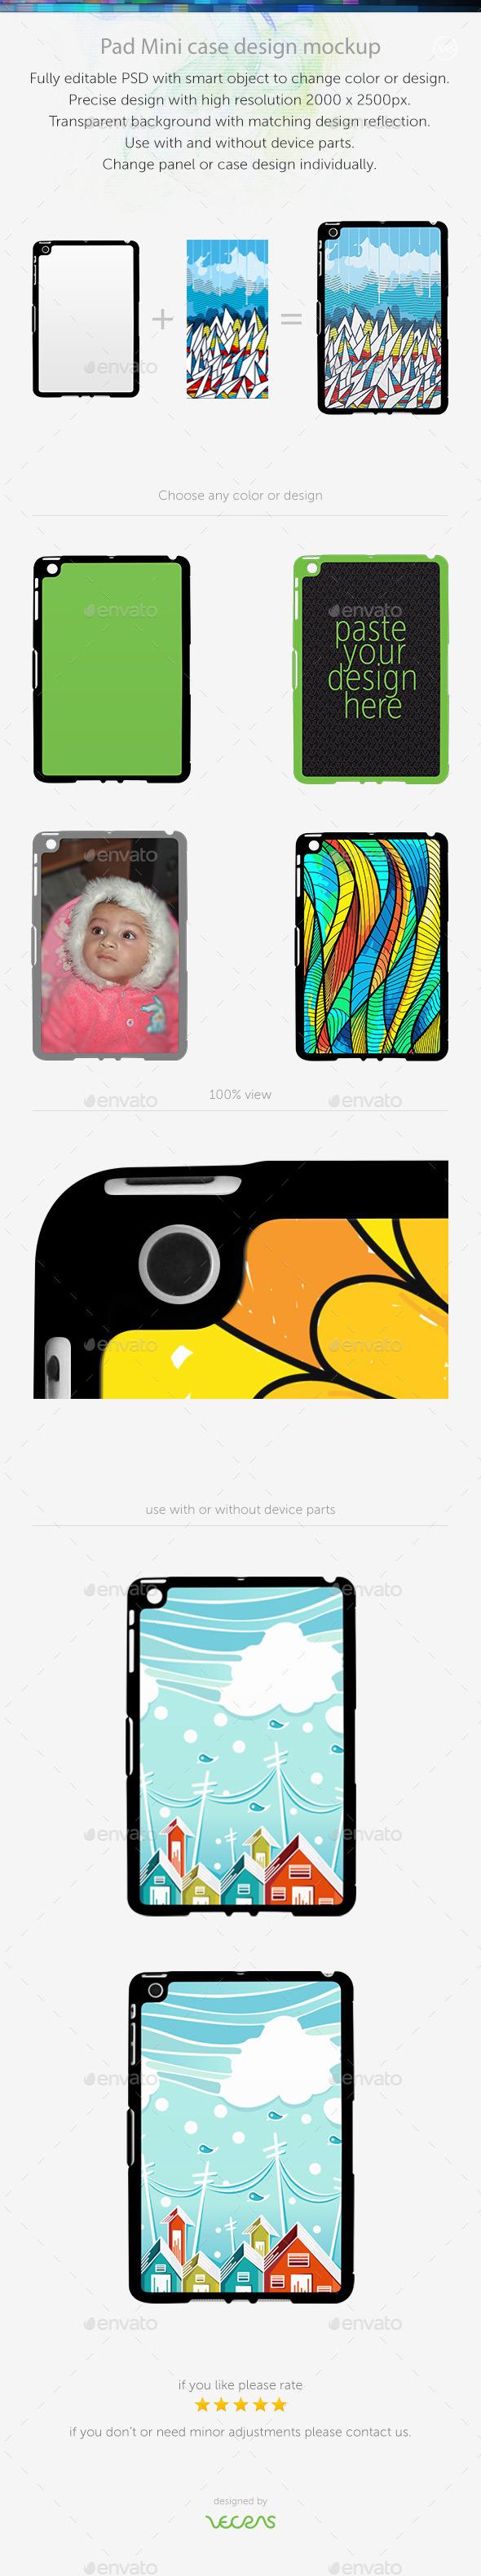 Pad Mini Sticker Case Design Mockup - Mobile Displays